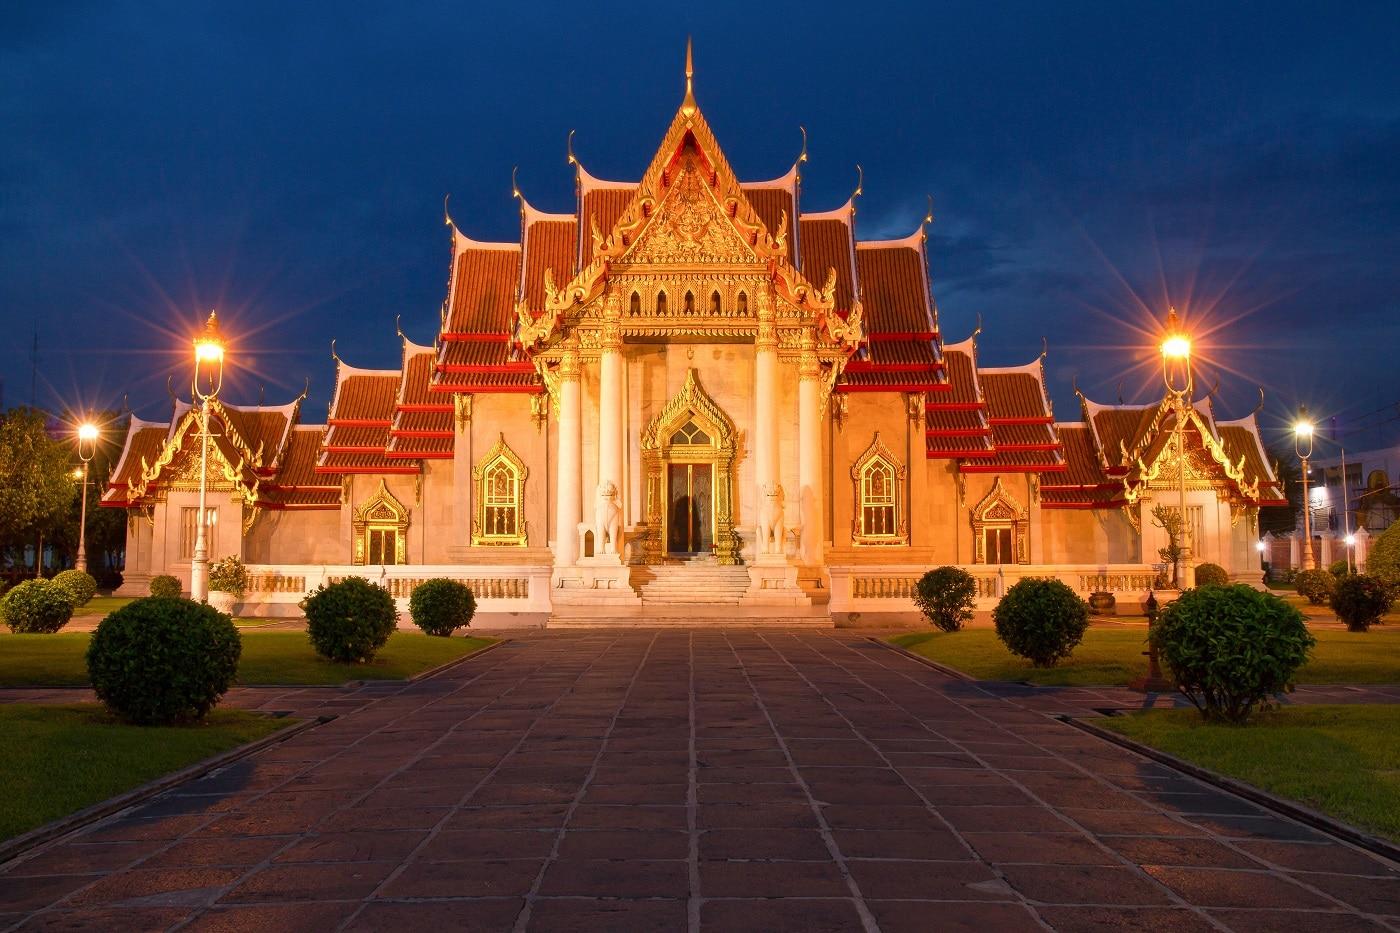 Templul Wat Benchamabophit, frumos iluminat în timpul nopții